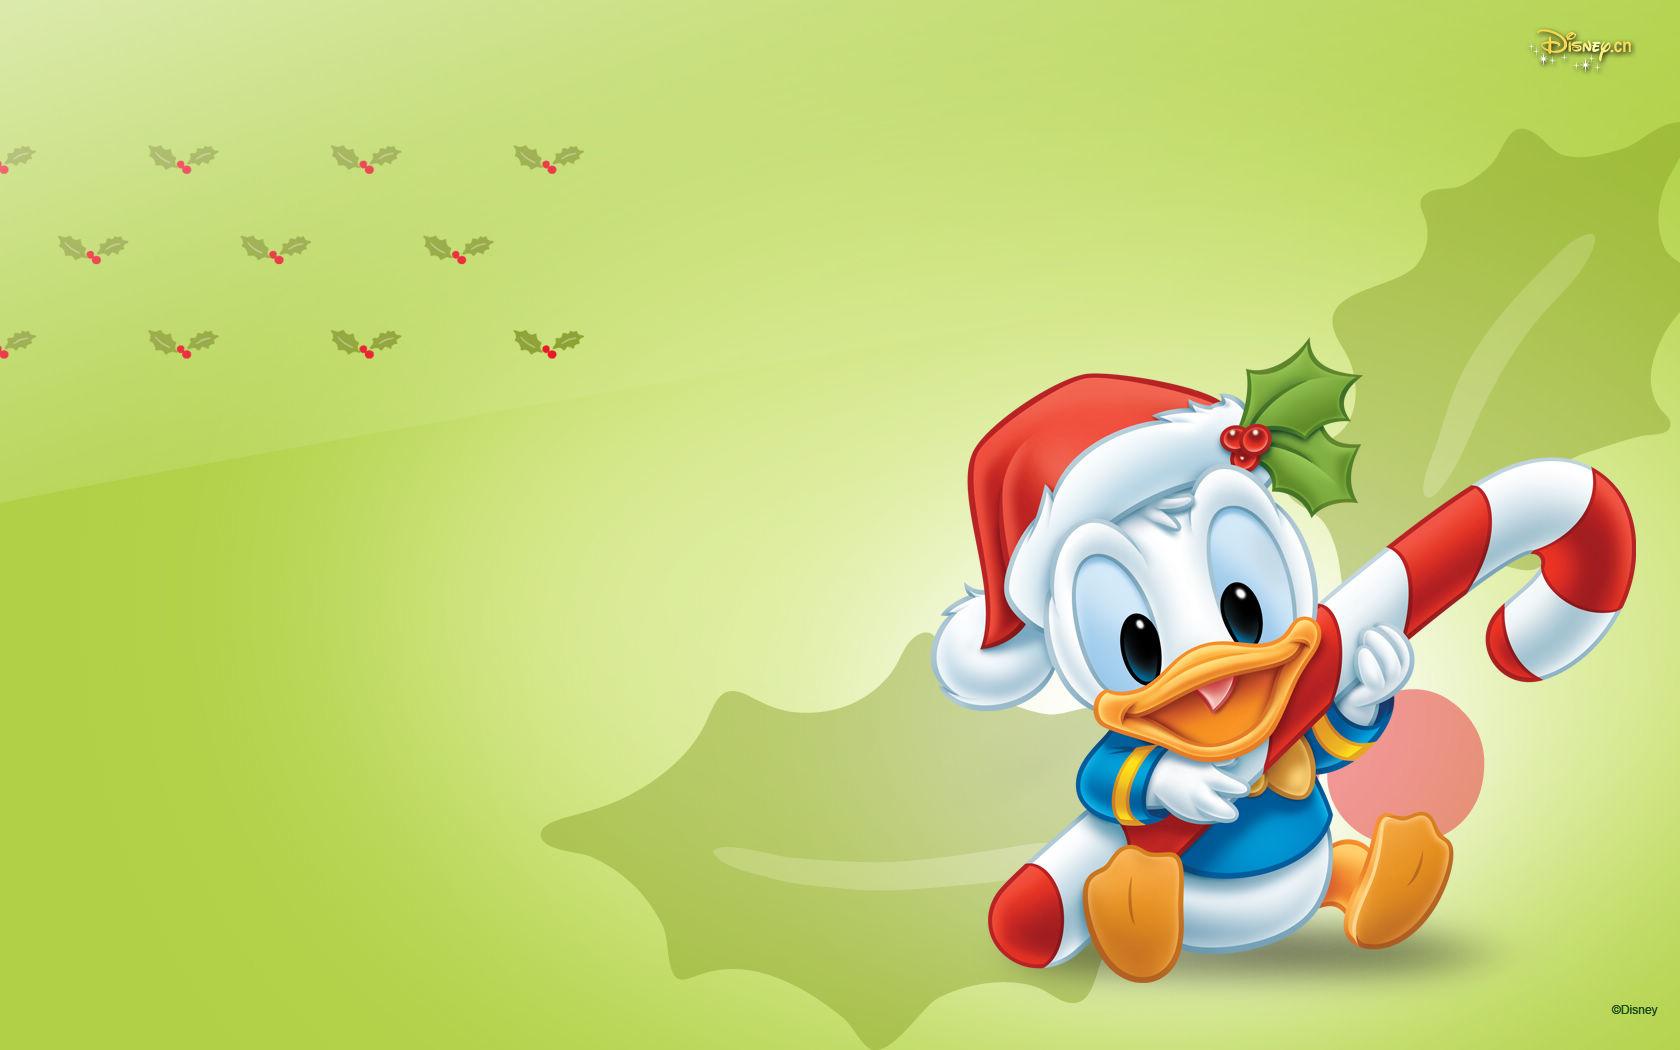 Fondos De Pantalla Del Pato Donald Wallpapers Hd Para